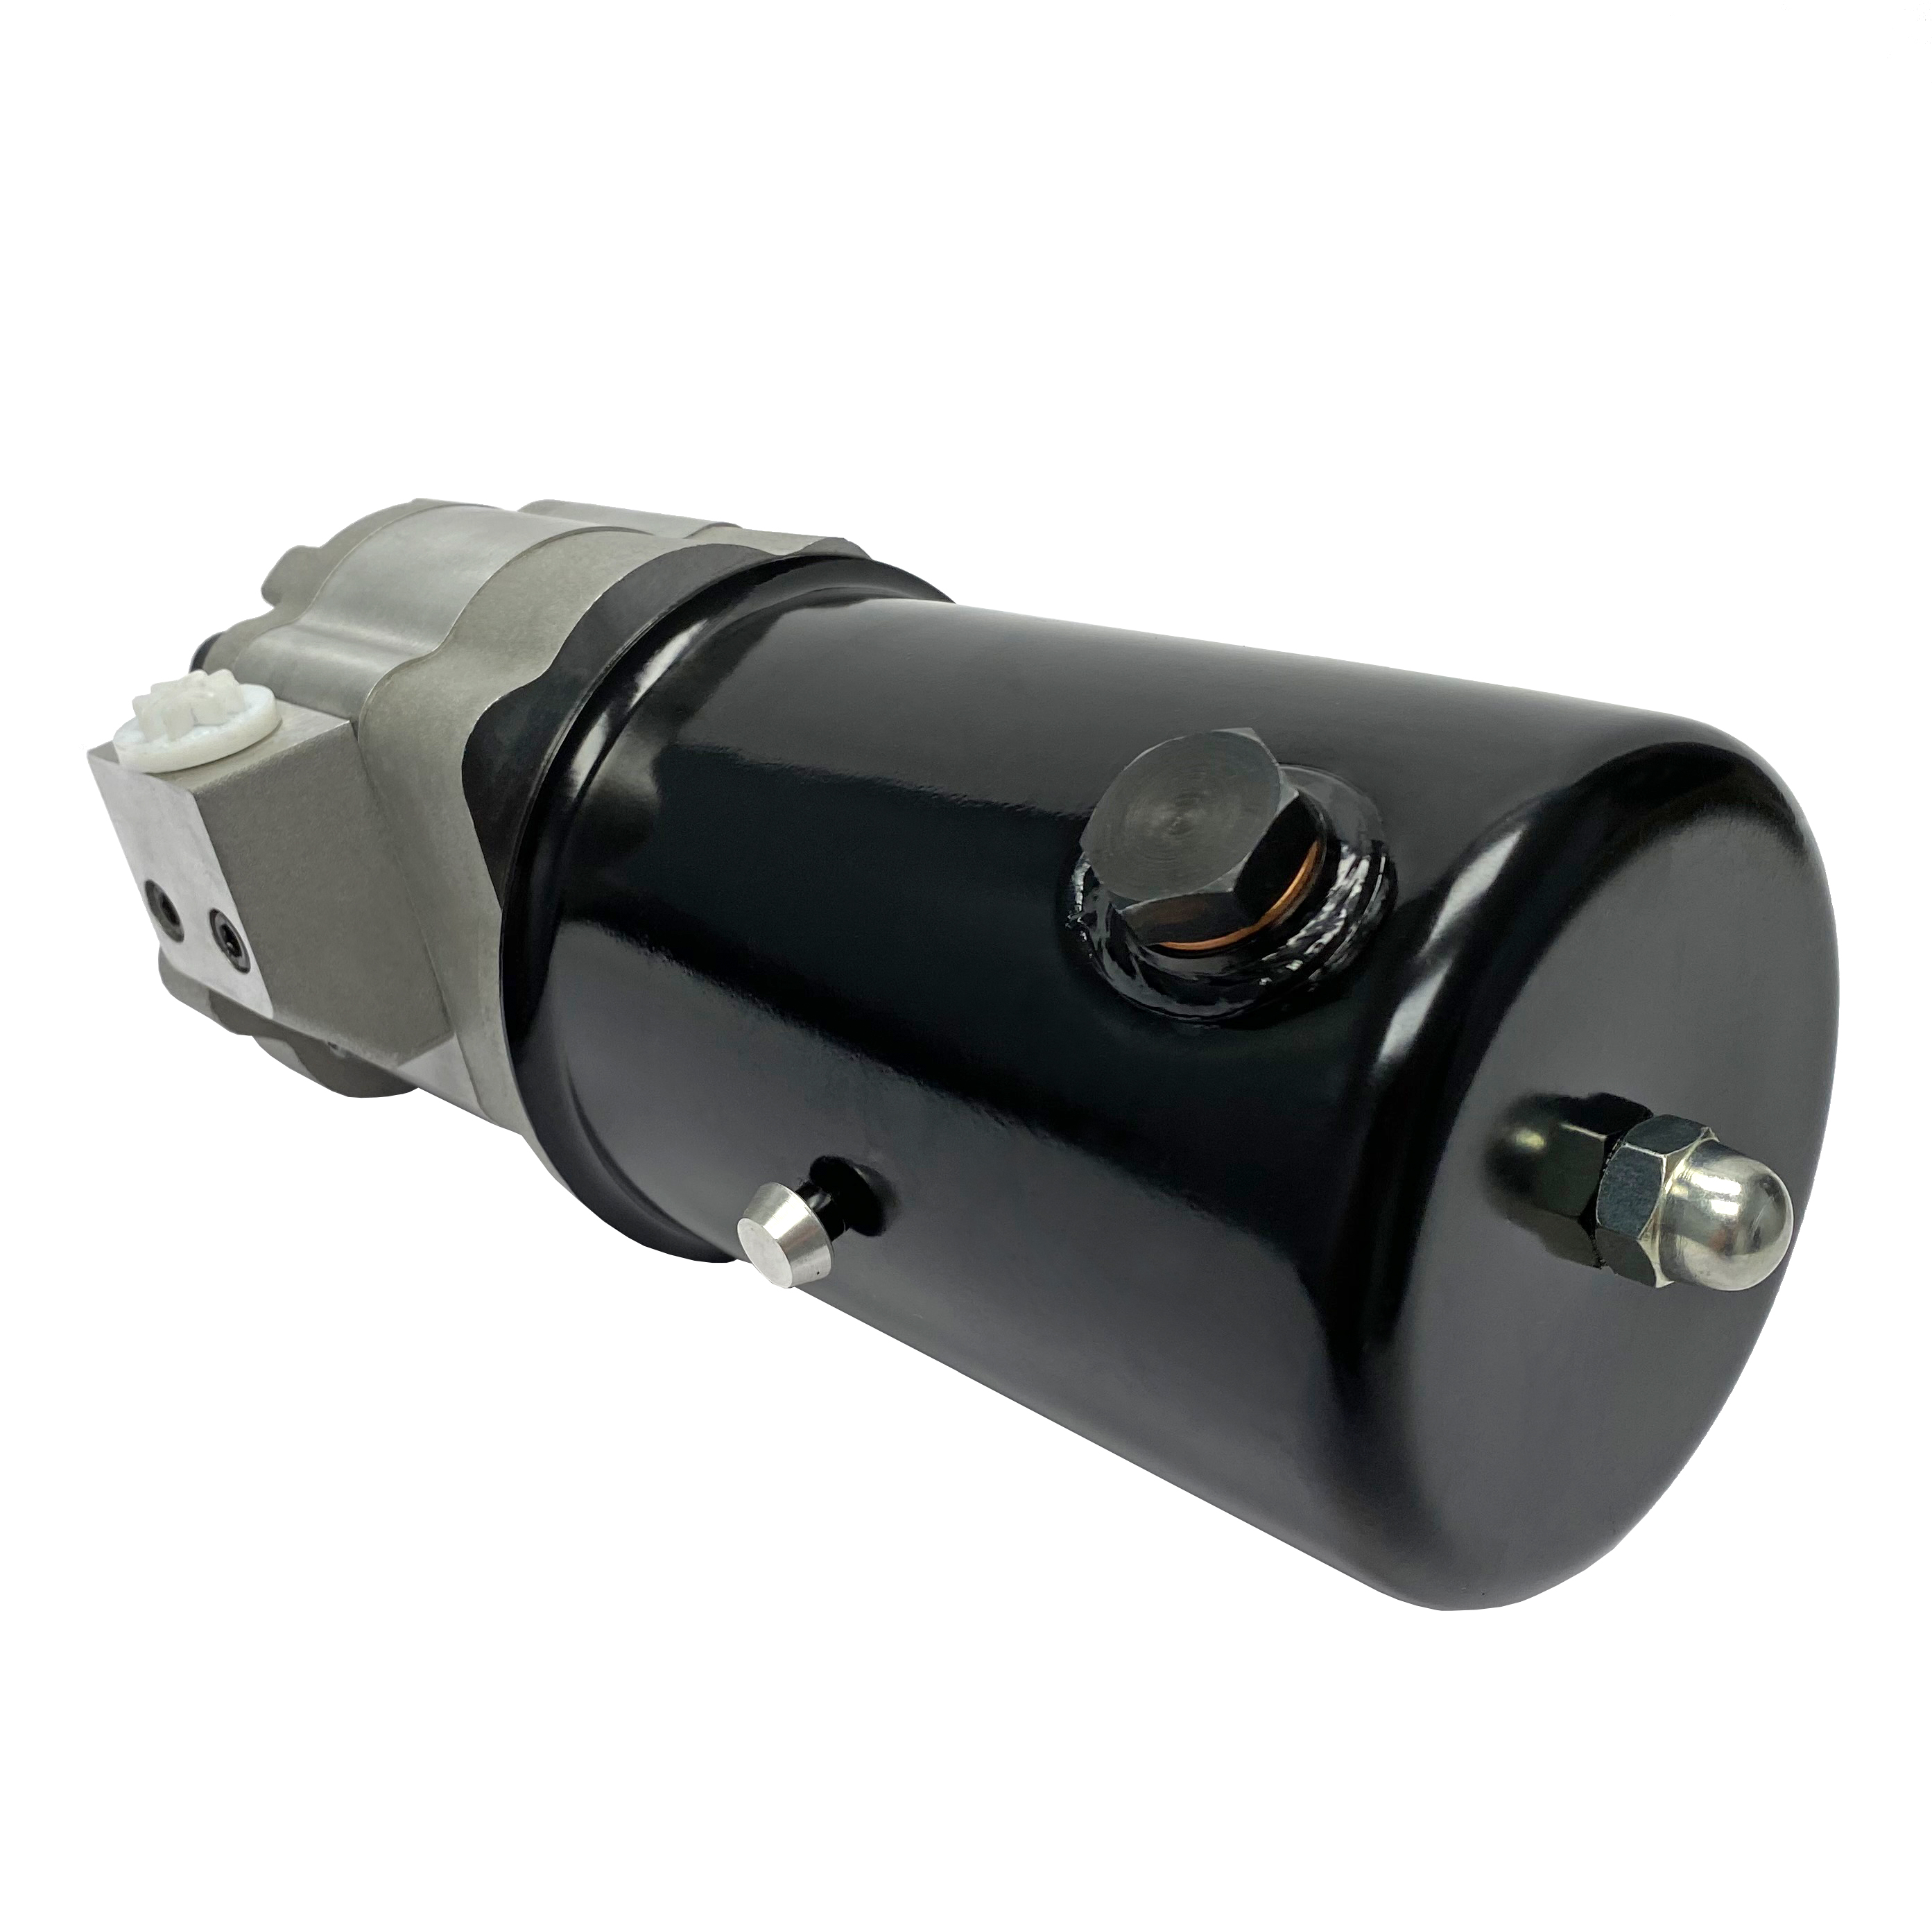 Hydraulic gear pump replacement for Massey Ferguson 897147M95 | Magister Hydraulics